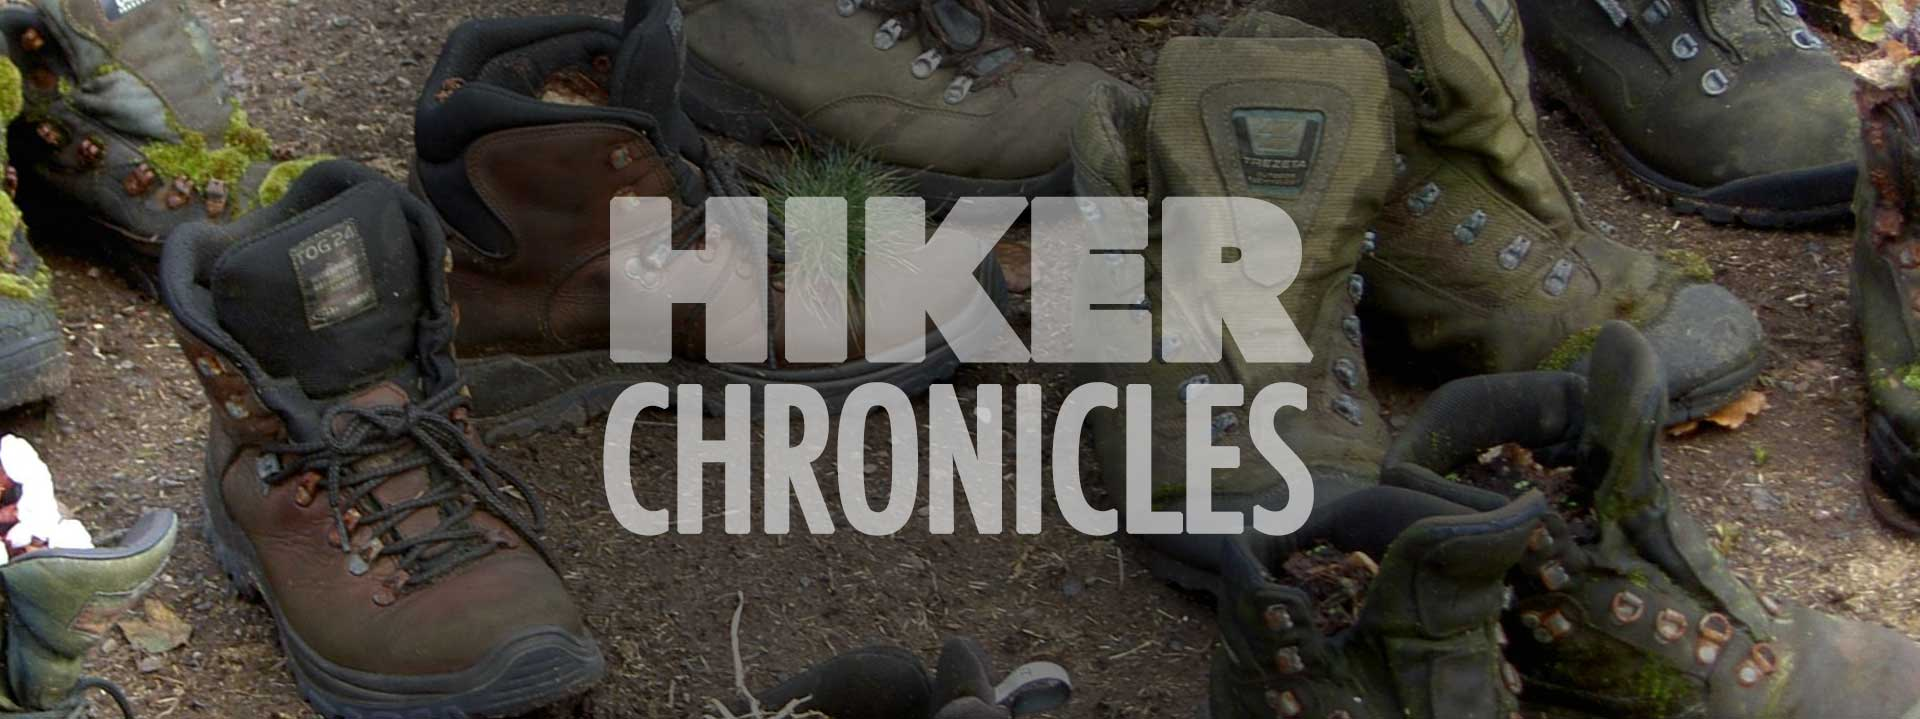 HIKER CHRONICLES